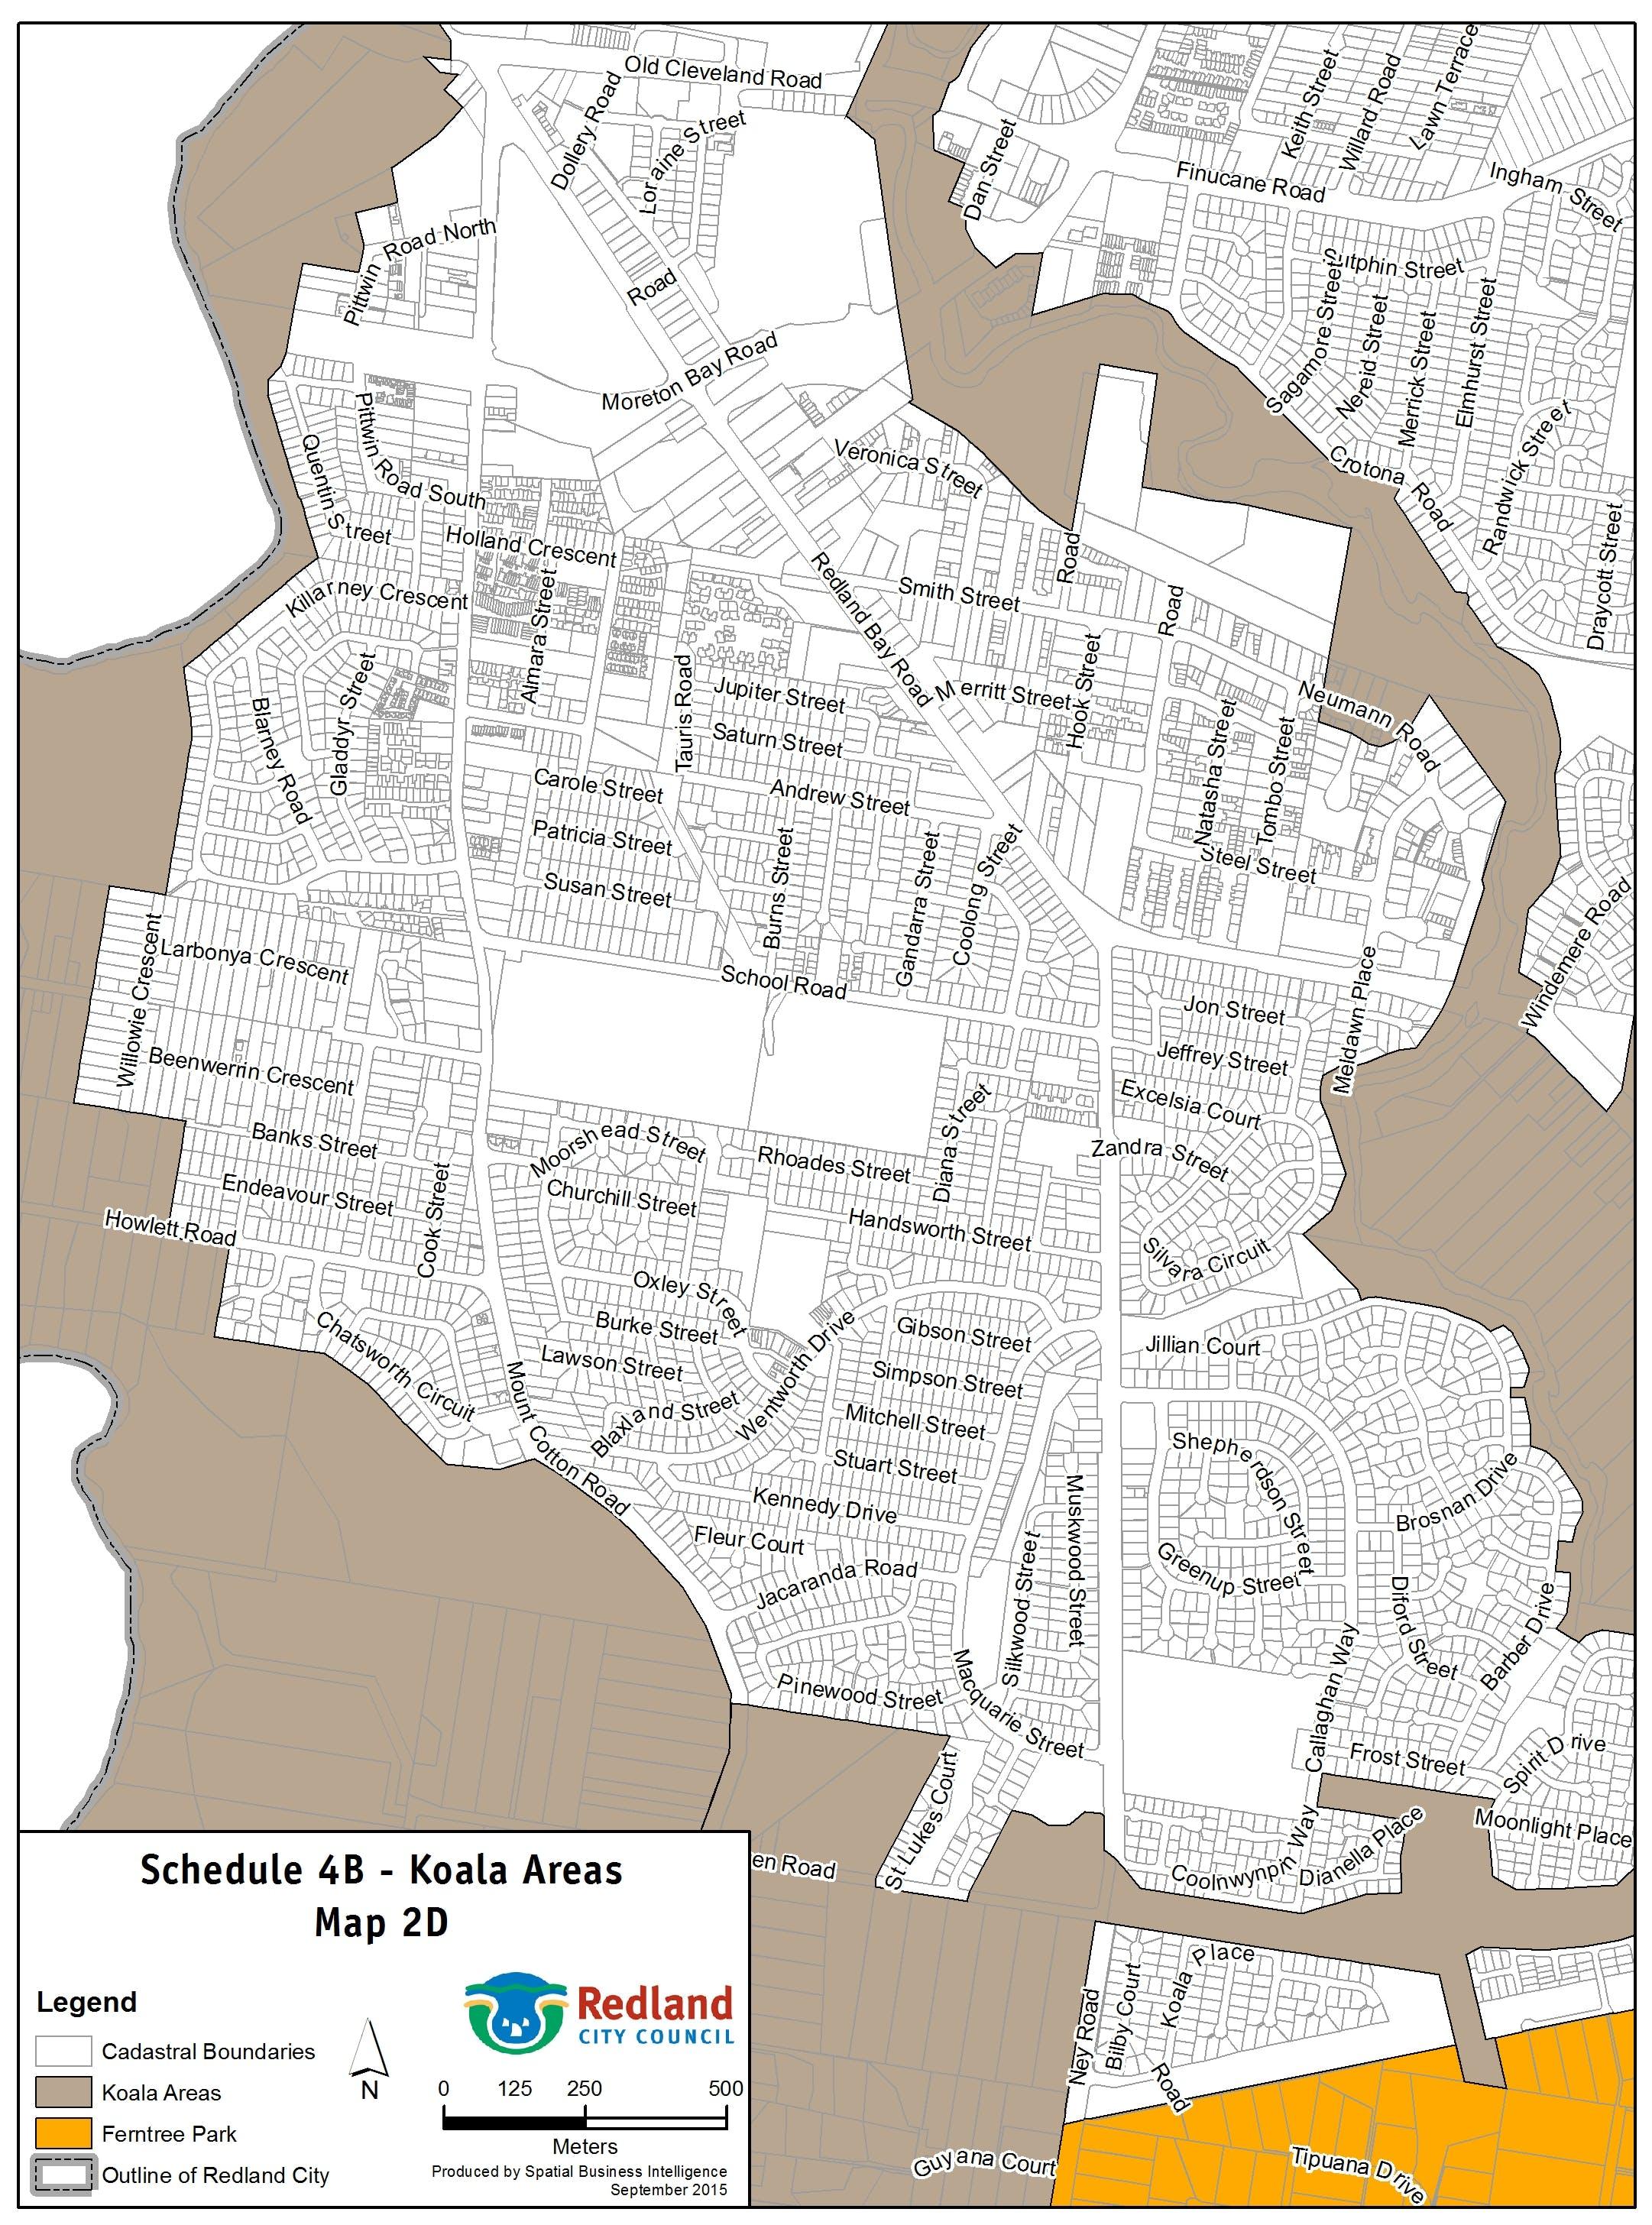 Koala Areas - Map 2 D